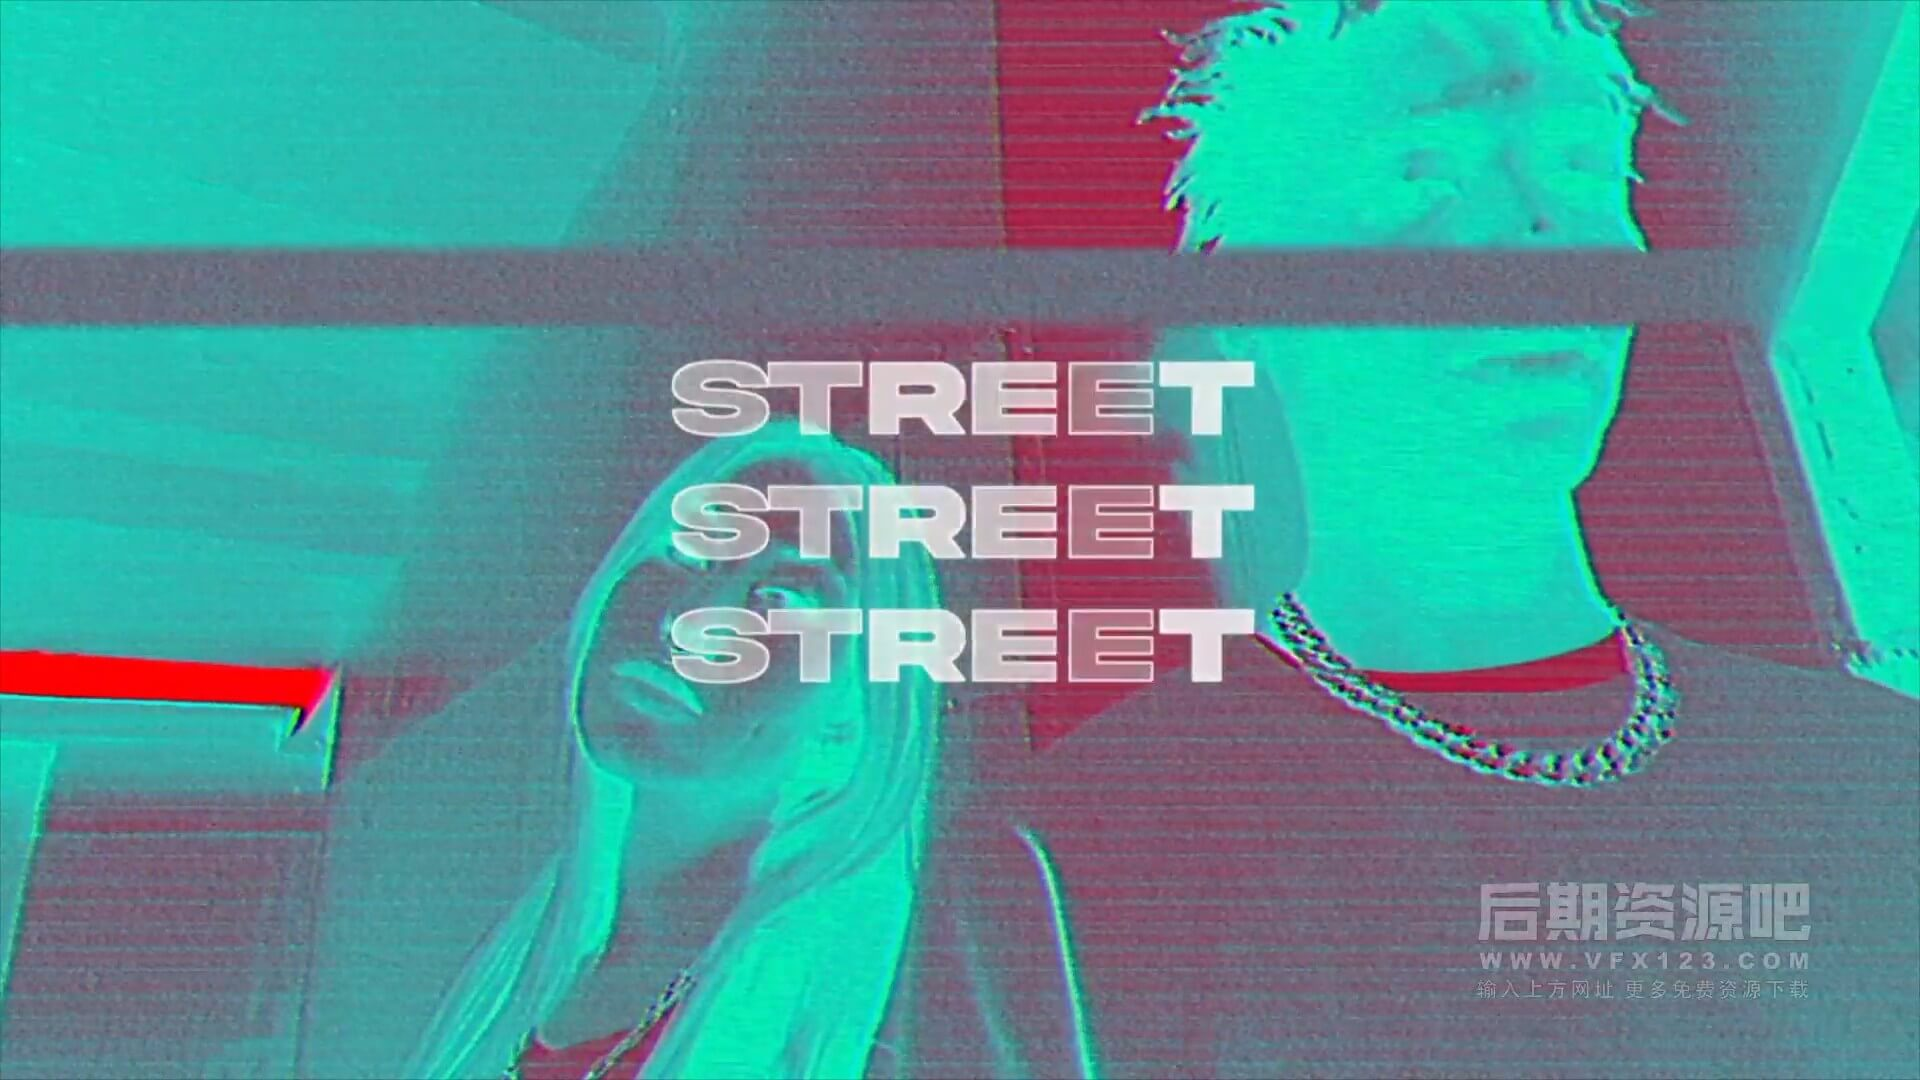 fcpx插件 时尚街头VHS毛刺效果图文展示片头 VHS Street Opener